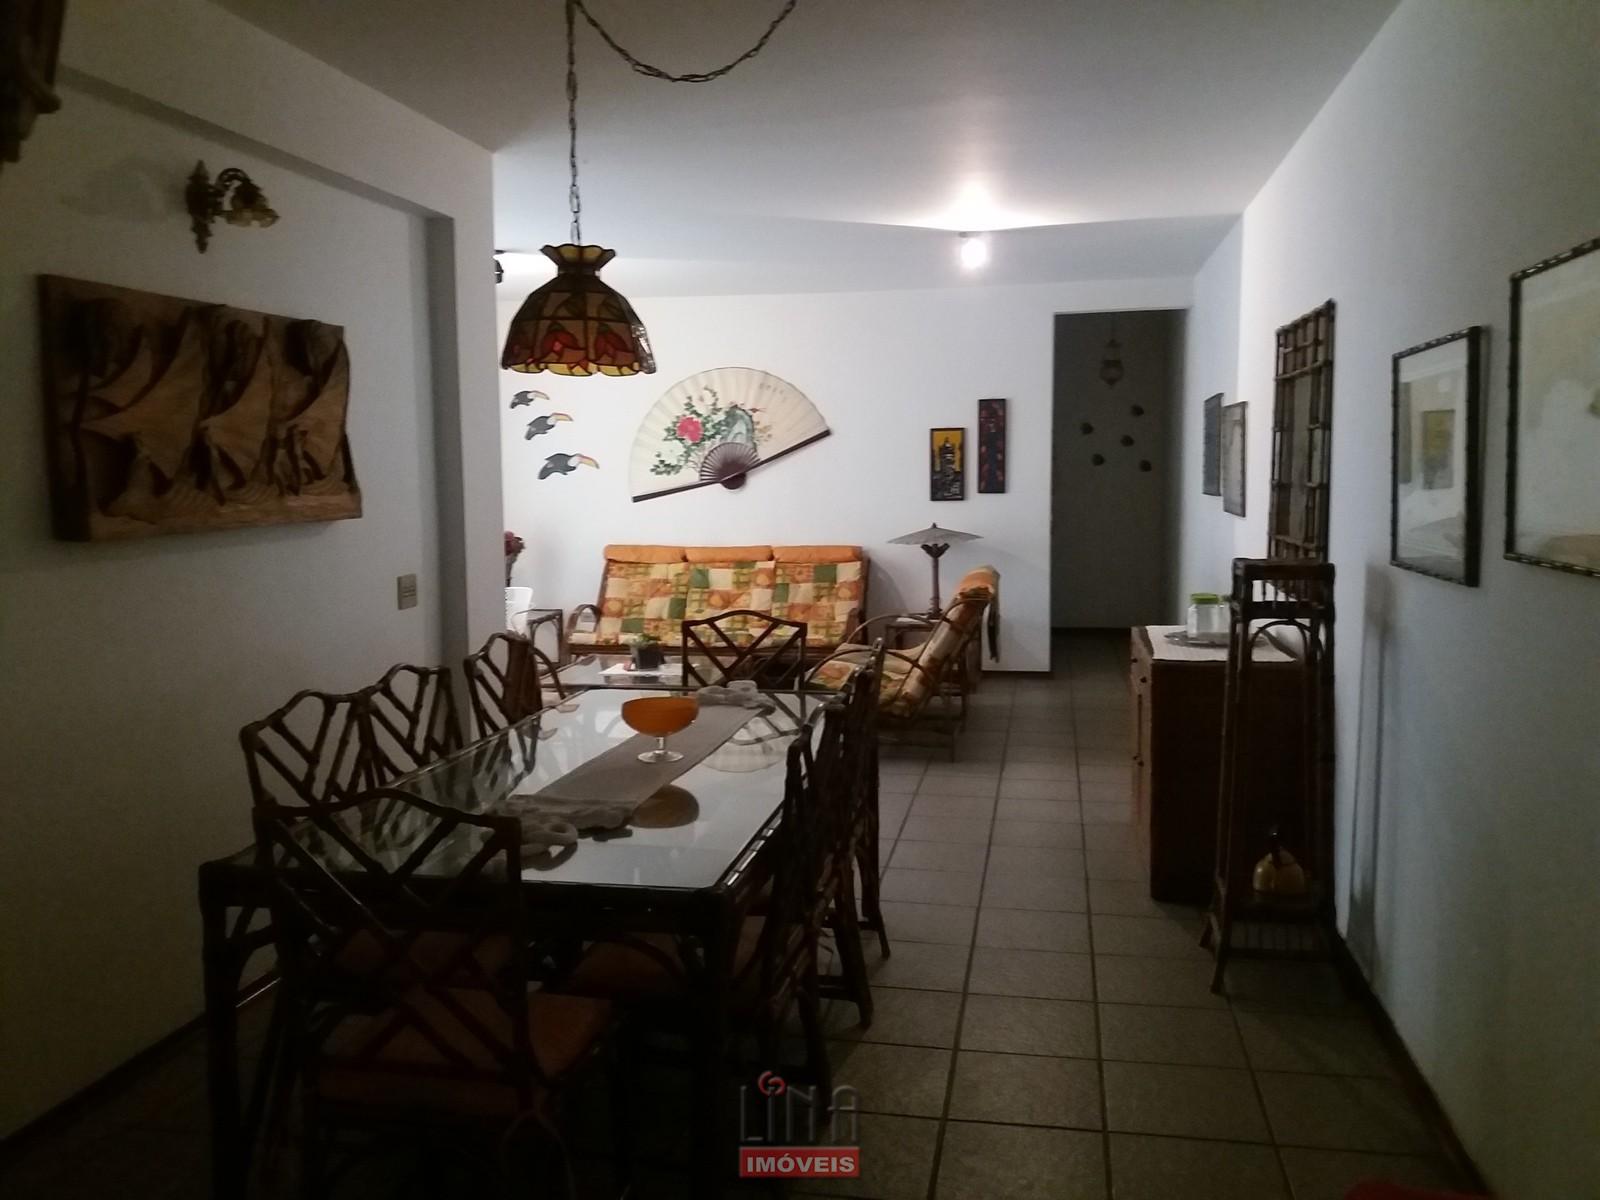 Apto 3 dorms, 127m², 300m da praia Enseada, Gjá